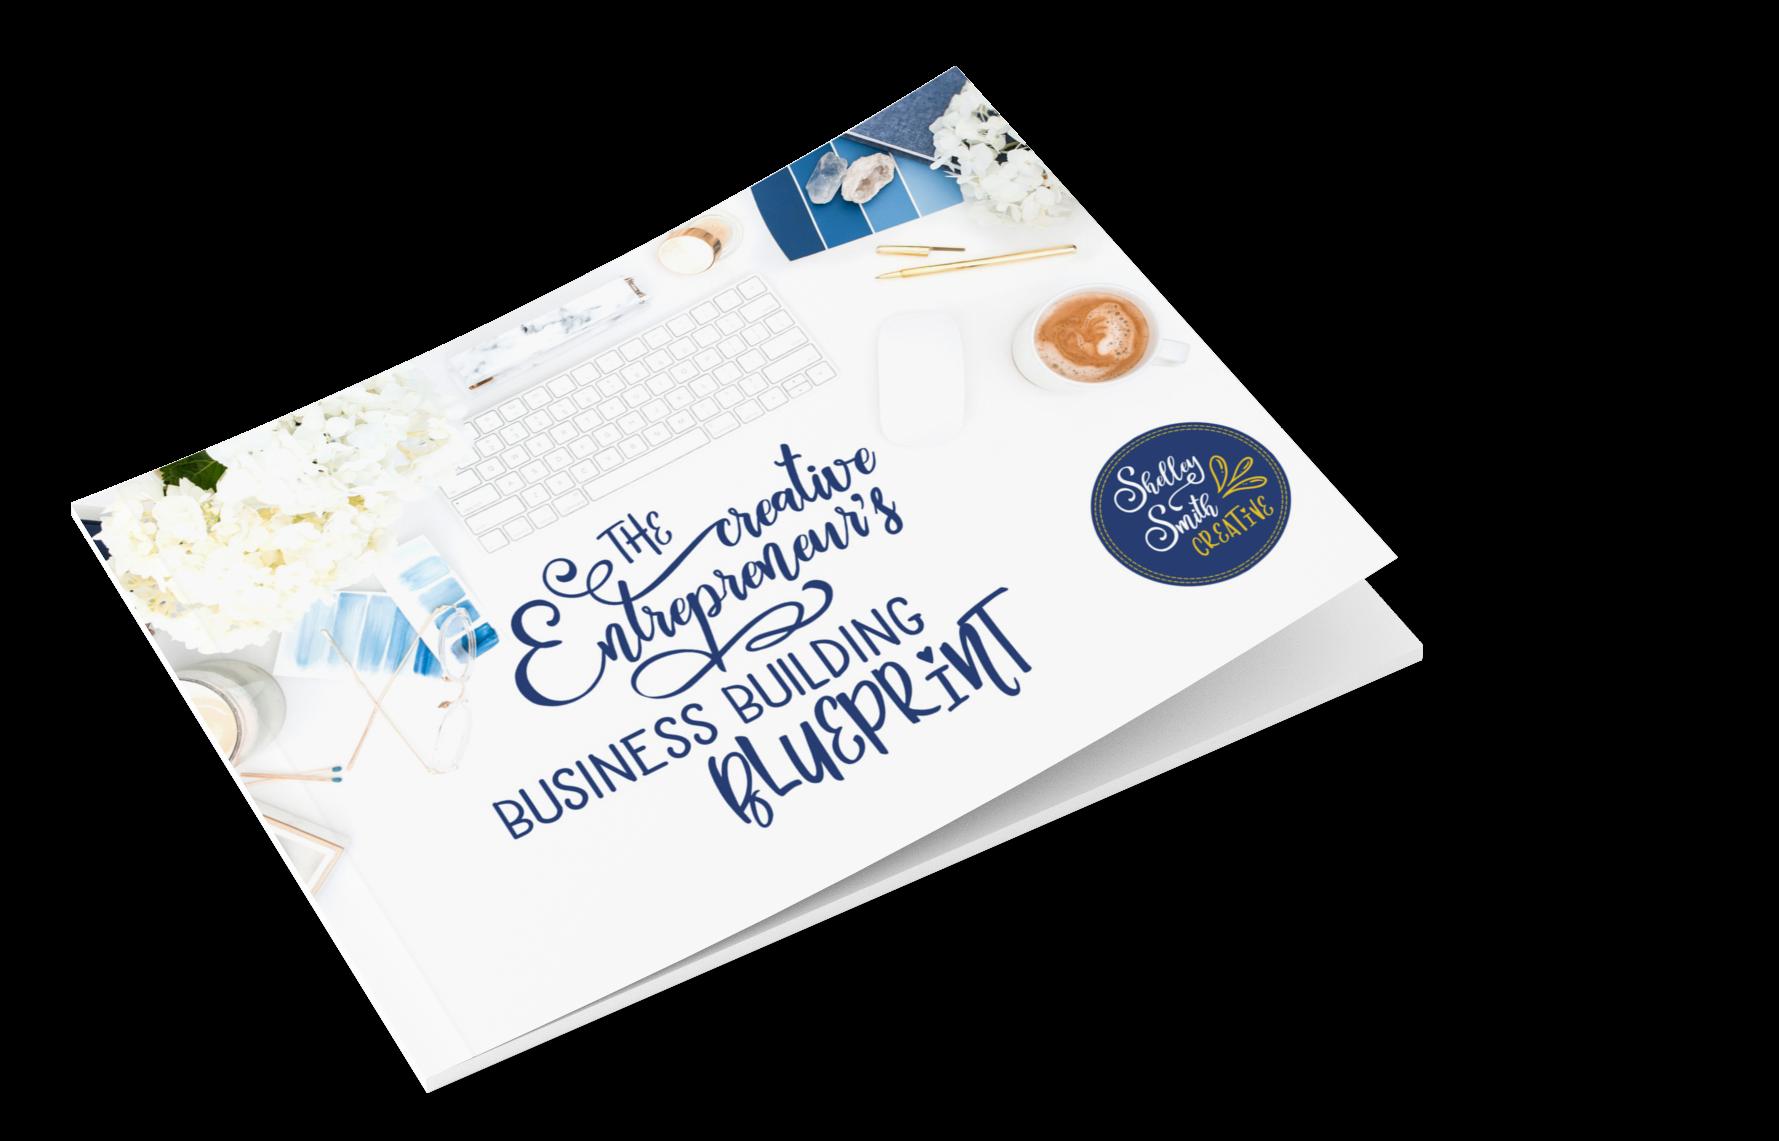 The Creative Entrepreneur's Business Building Blueprint by Shelley Smith Creative